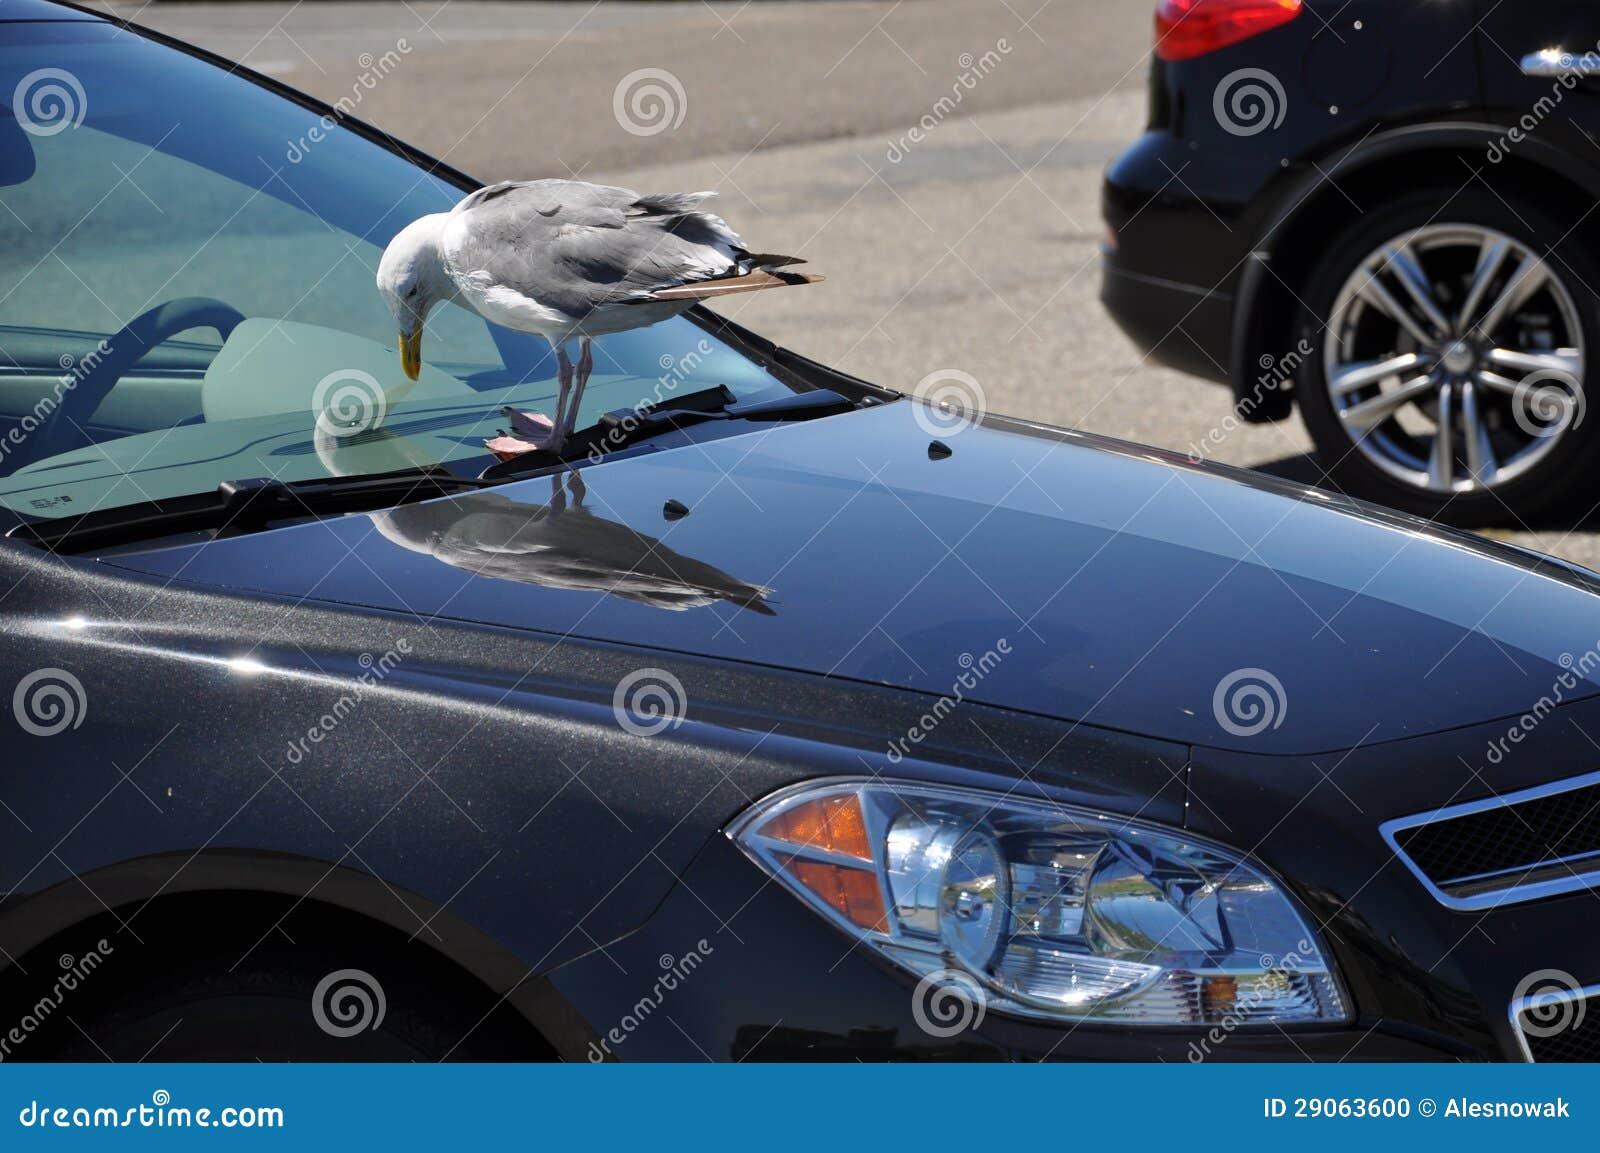 Car and the bird